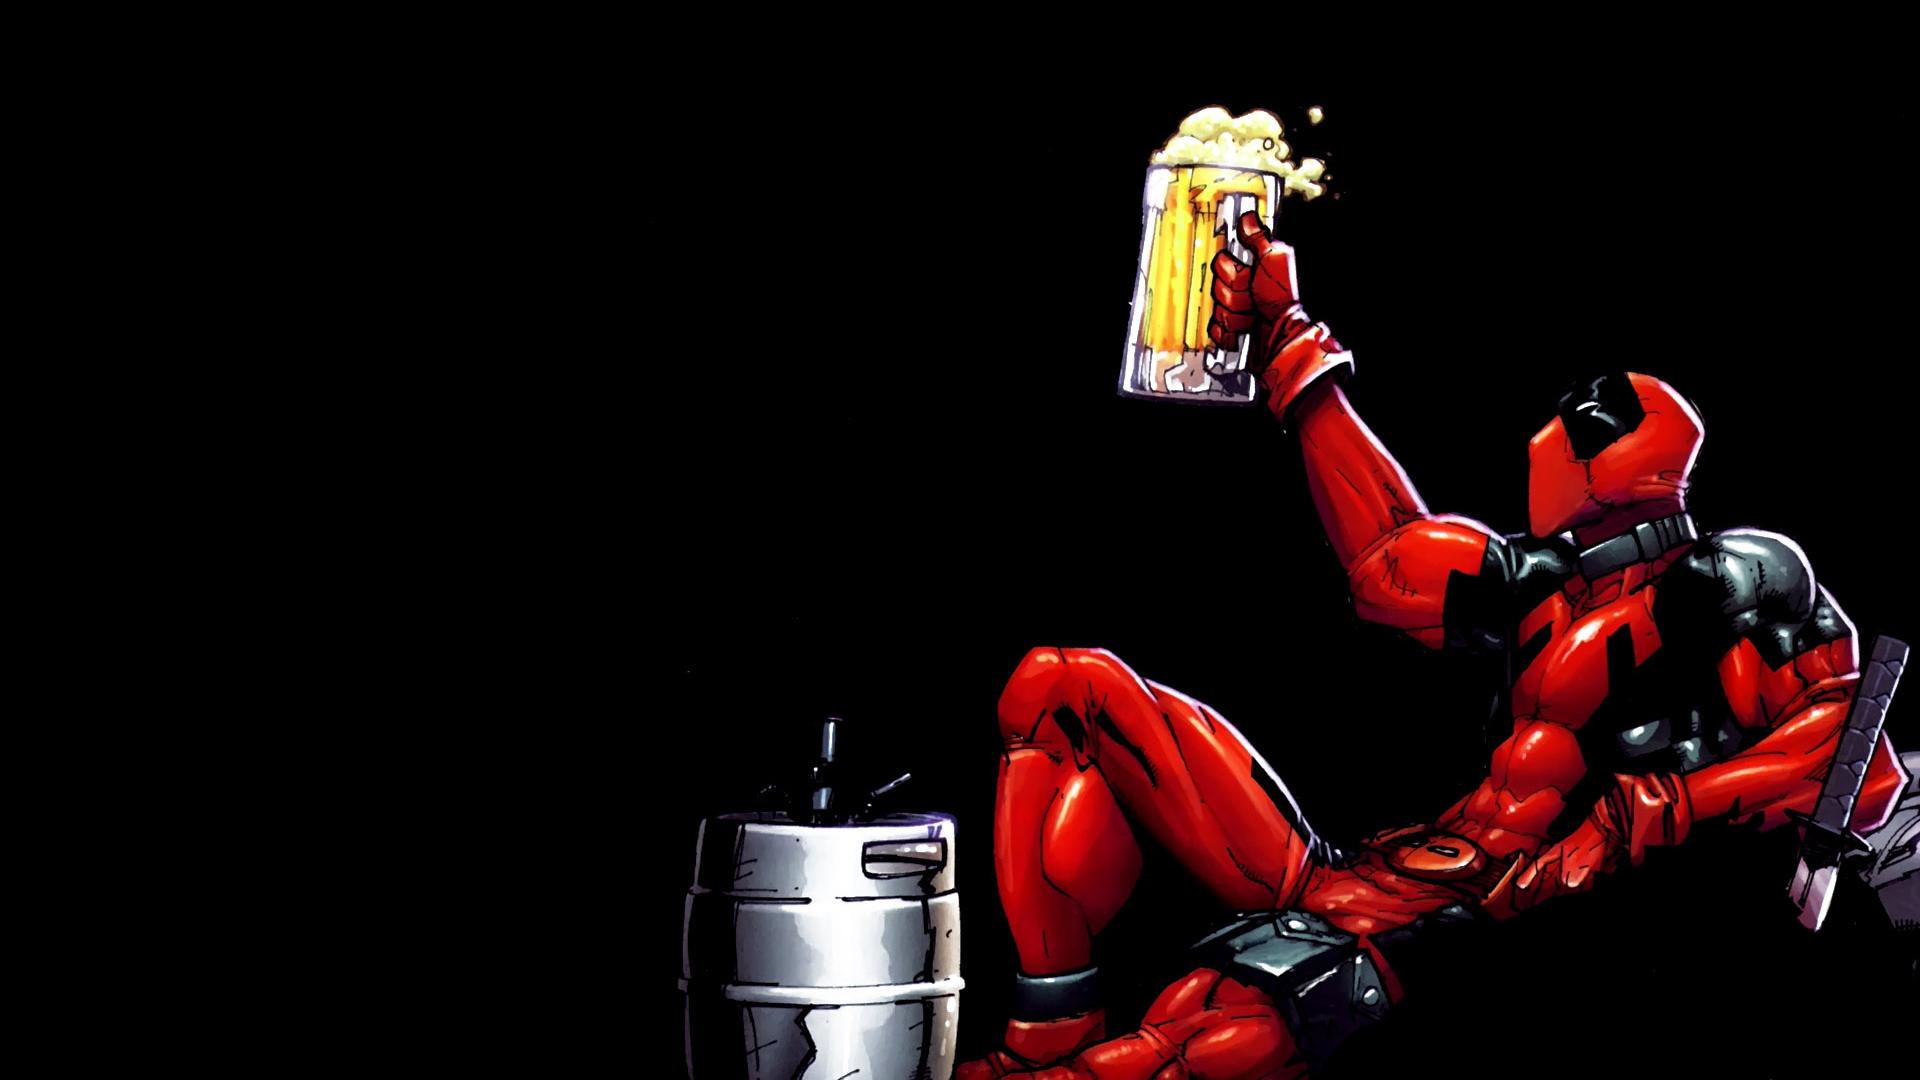 Deadpool-Funny-Funny-Deadpool-1920x1080-pixel-resolution-wallpaper-wp3604670